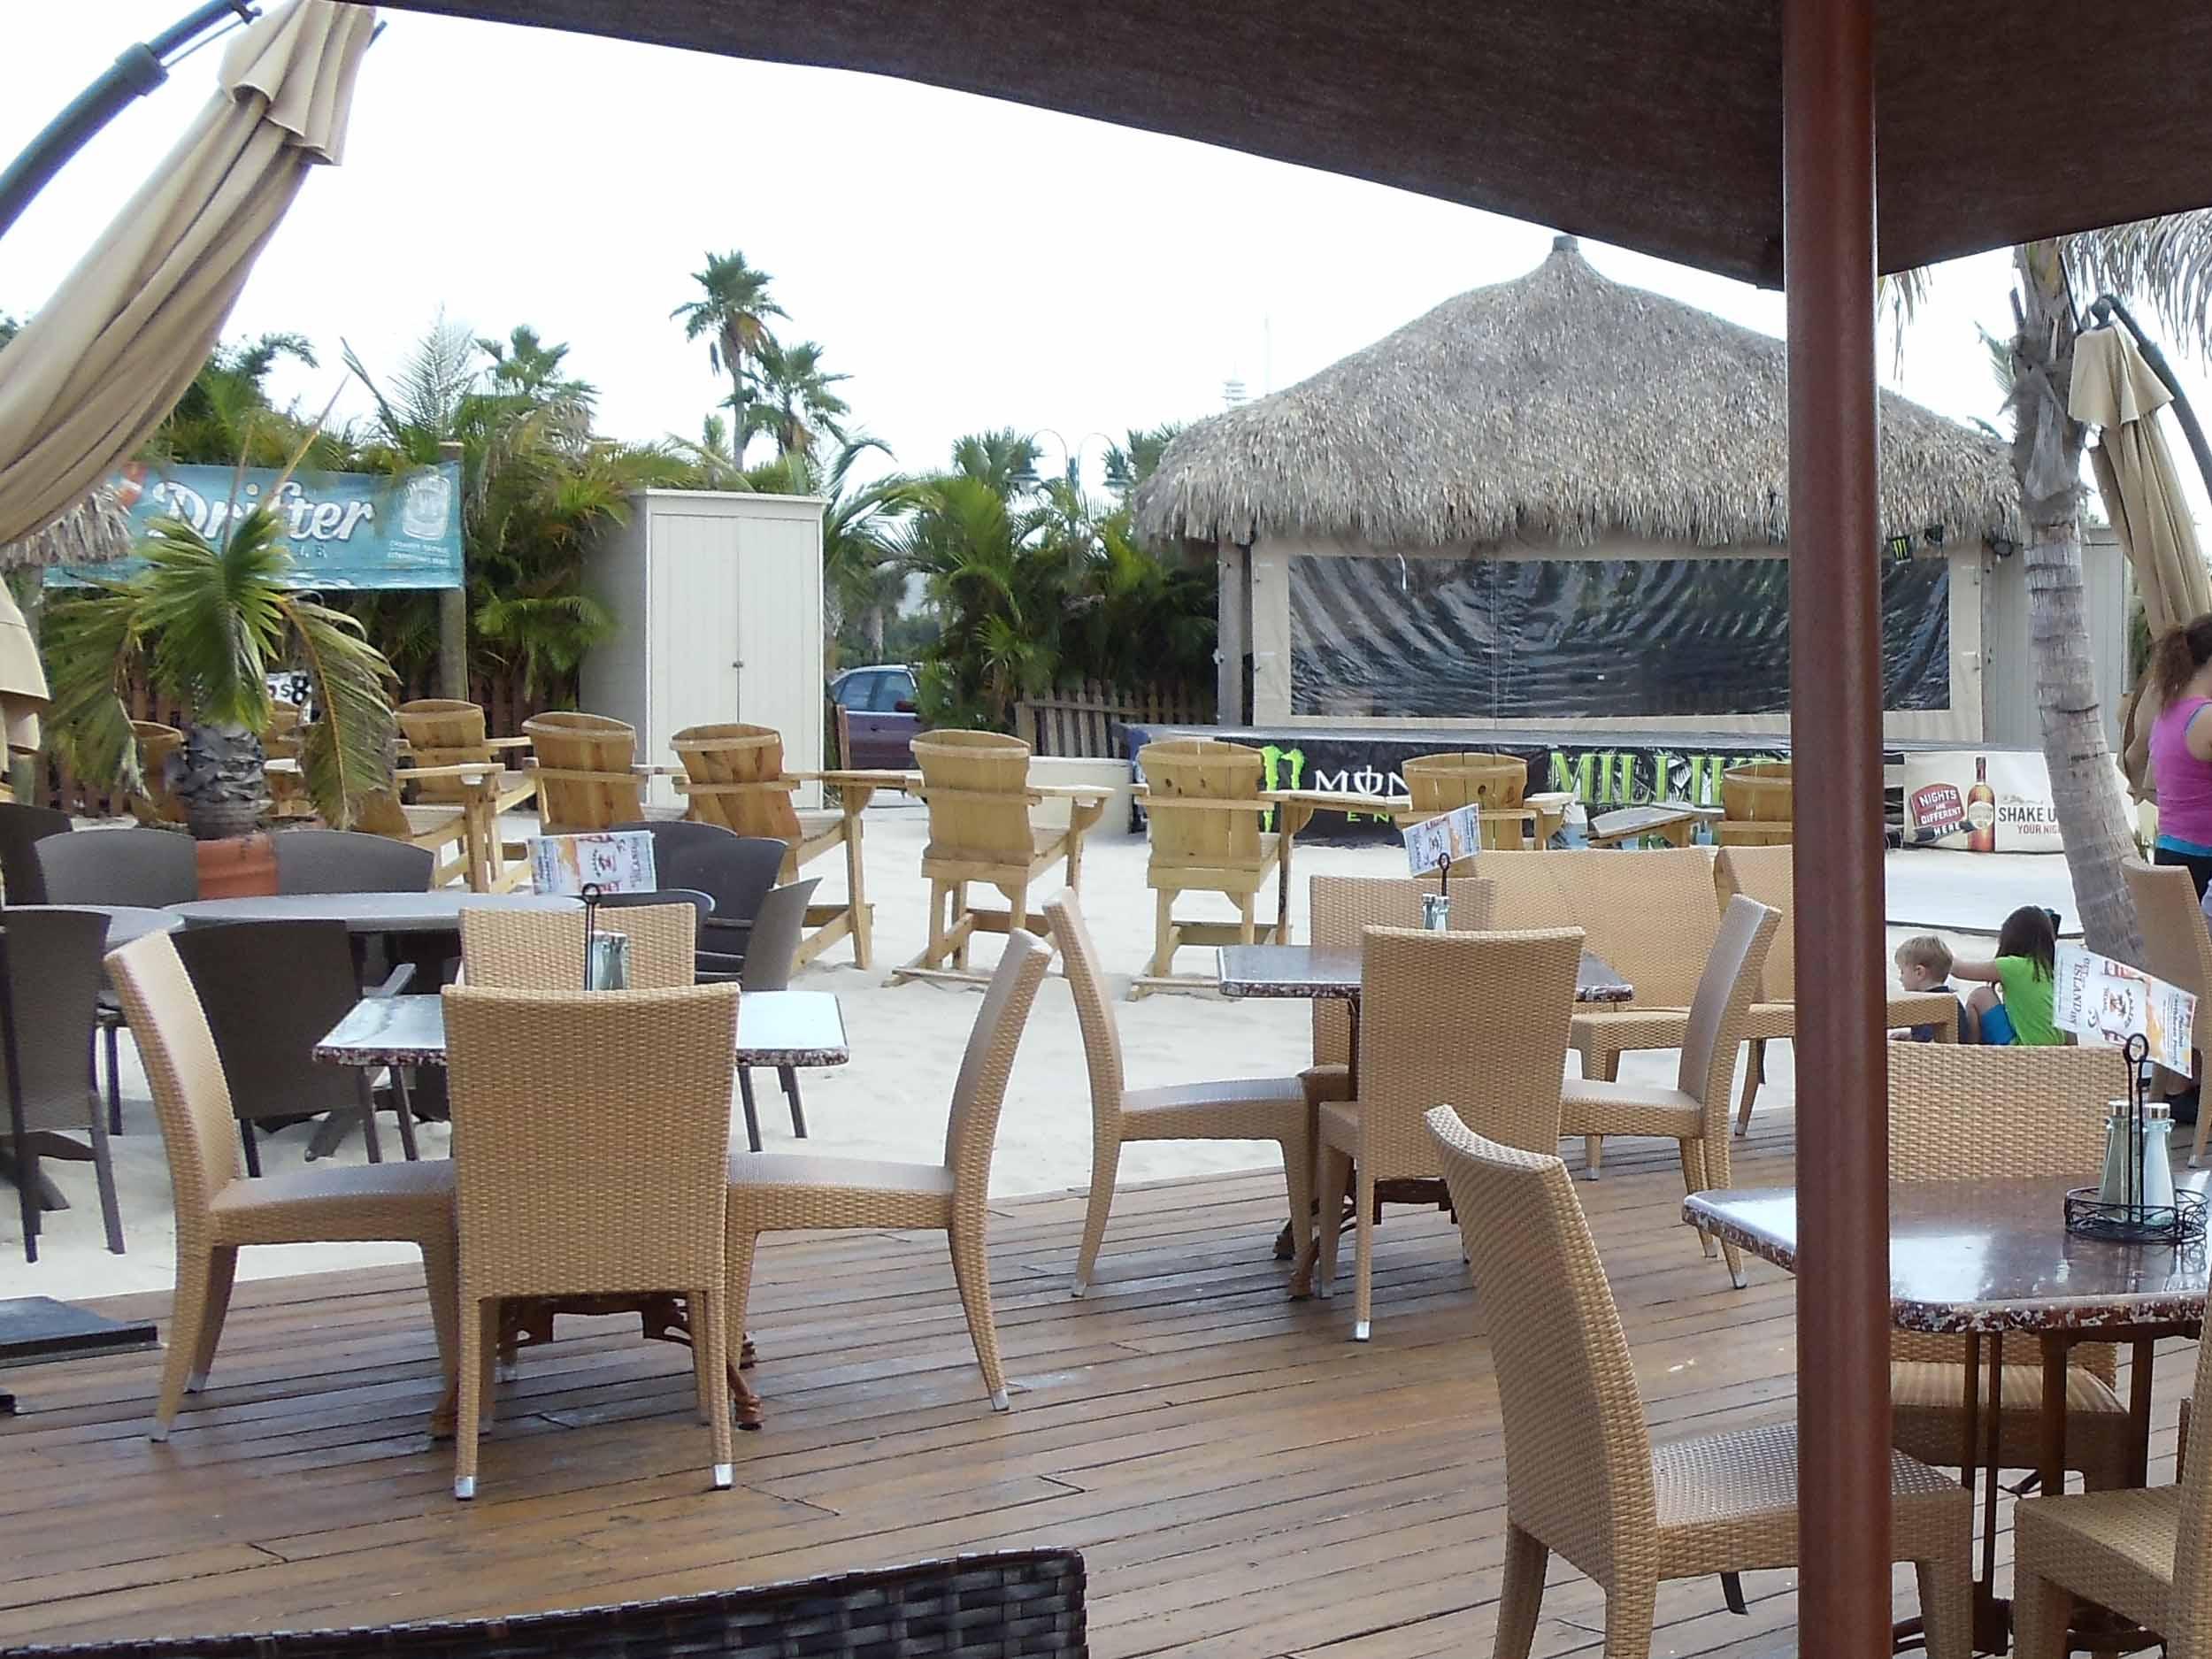 Milliken's Reef Seating Area